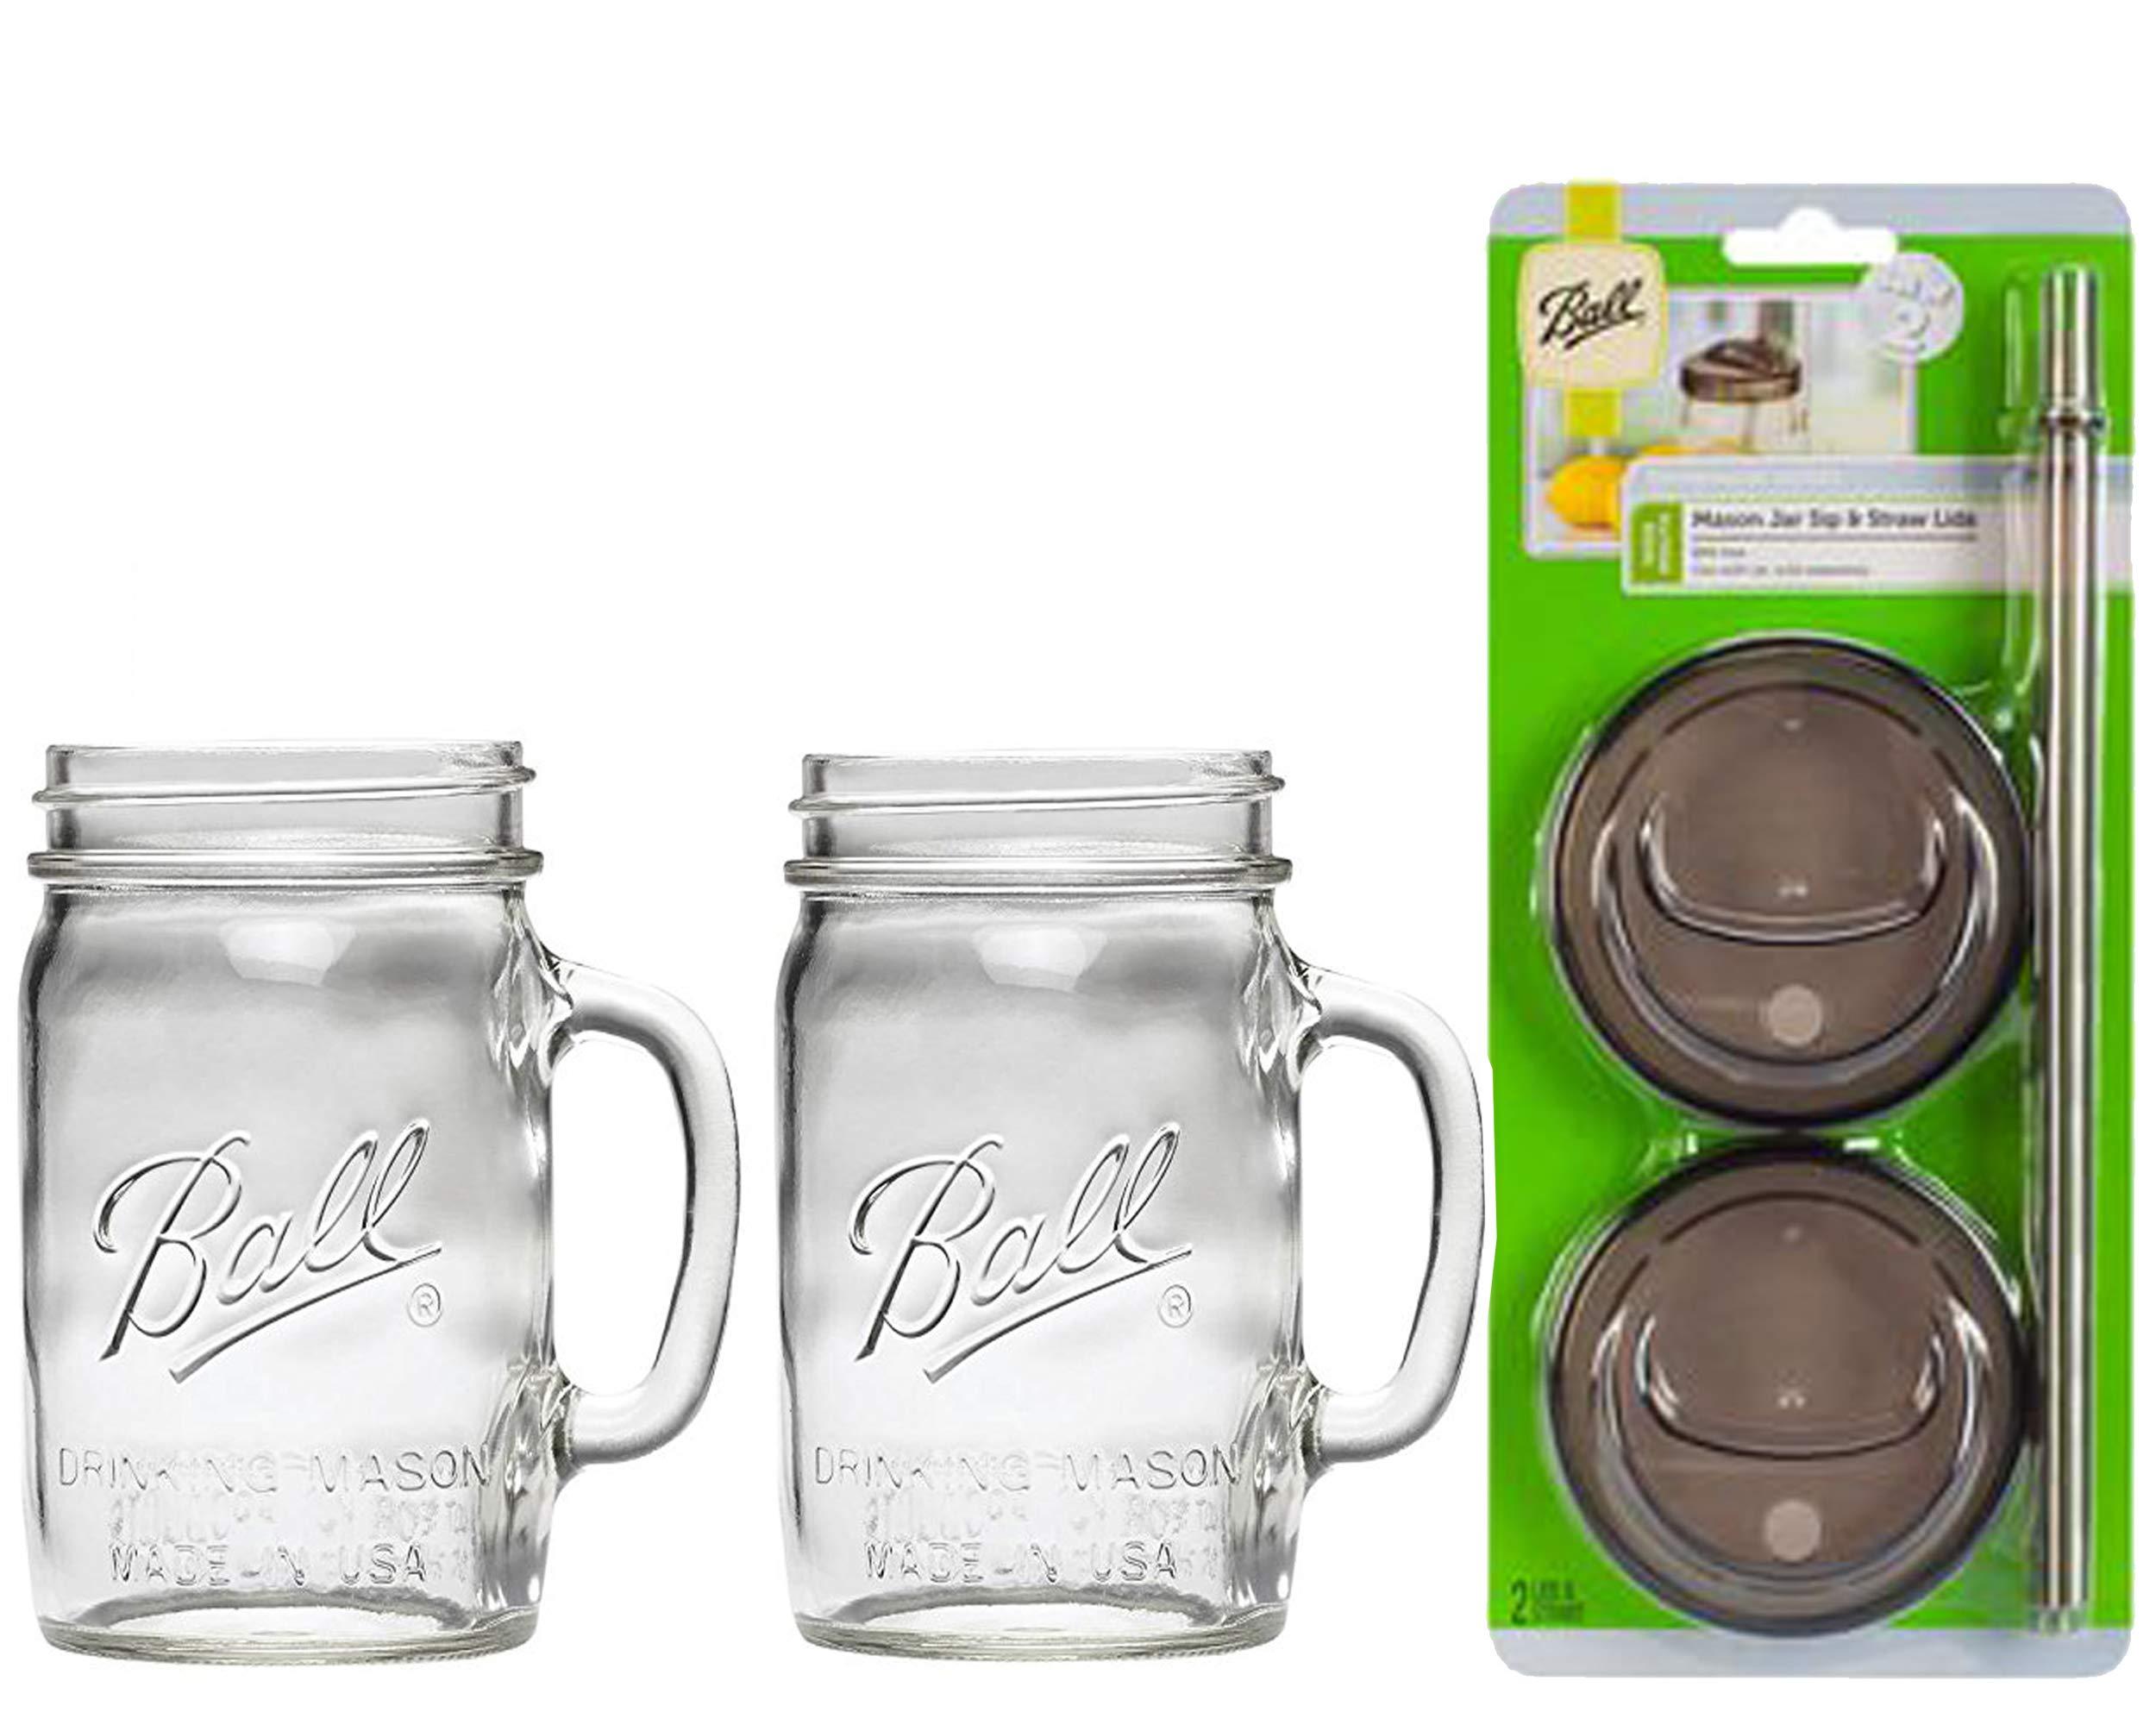 2 Ball Glass Mason Drinking Jars with 2 Sip and Straw Lids (2, 24oz Mug) by Ball